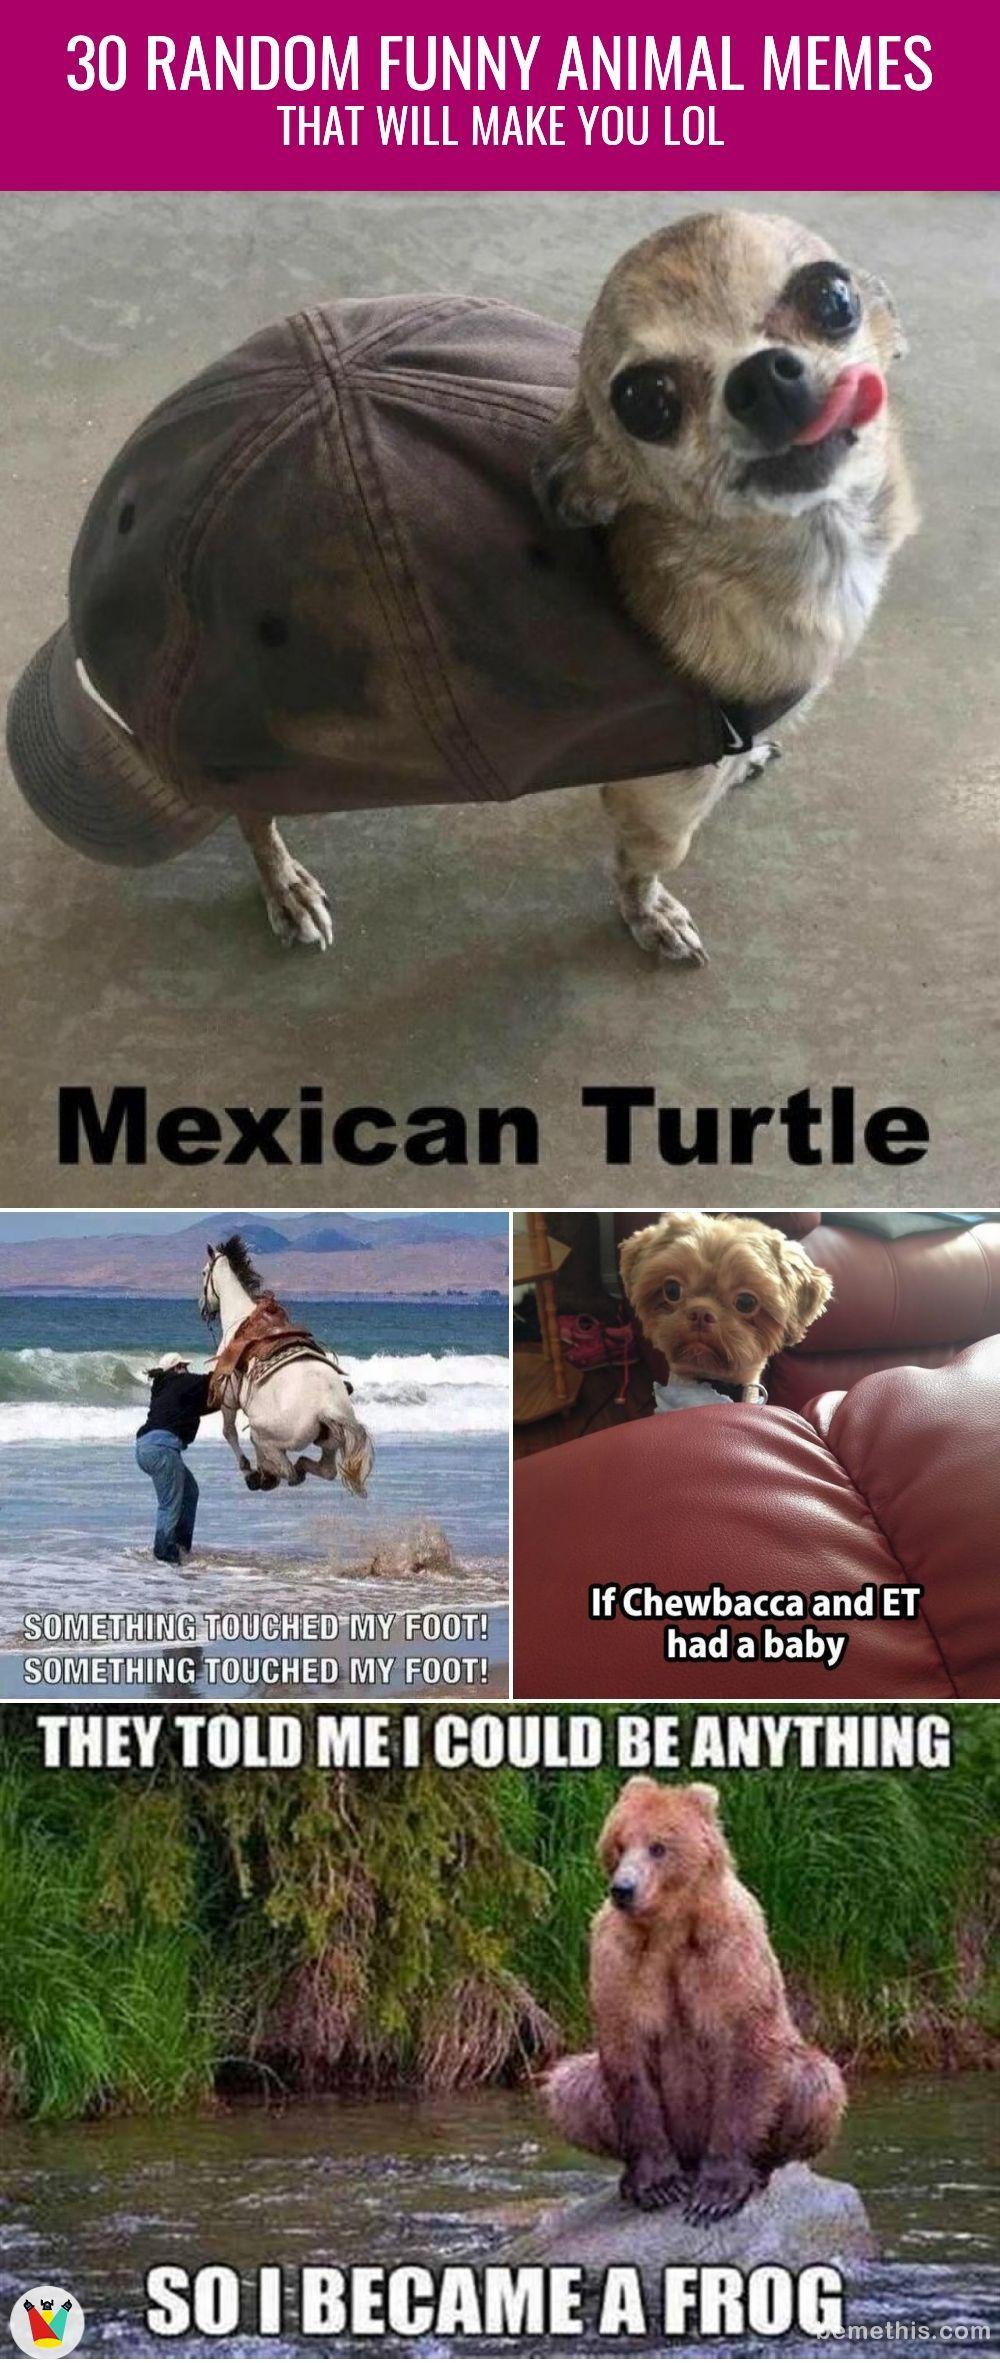 30 Random Funny Animal Memes That Will Make You Lol Funny Funnymemes Animals Animalmemes Lol Humor H Funny Animal Memes Animal Memes Cute Funny Animals